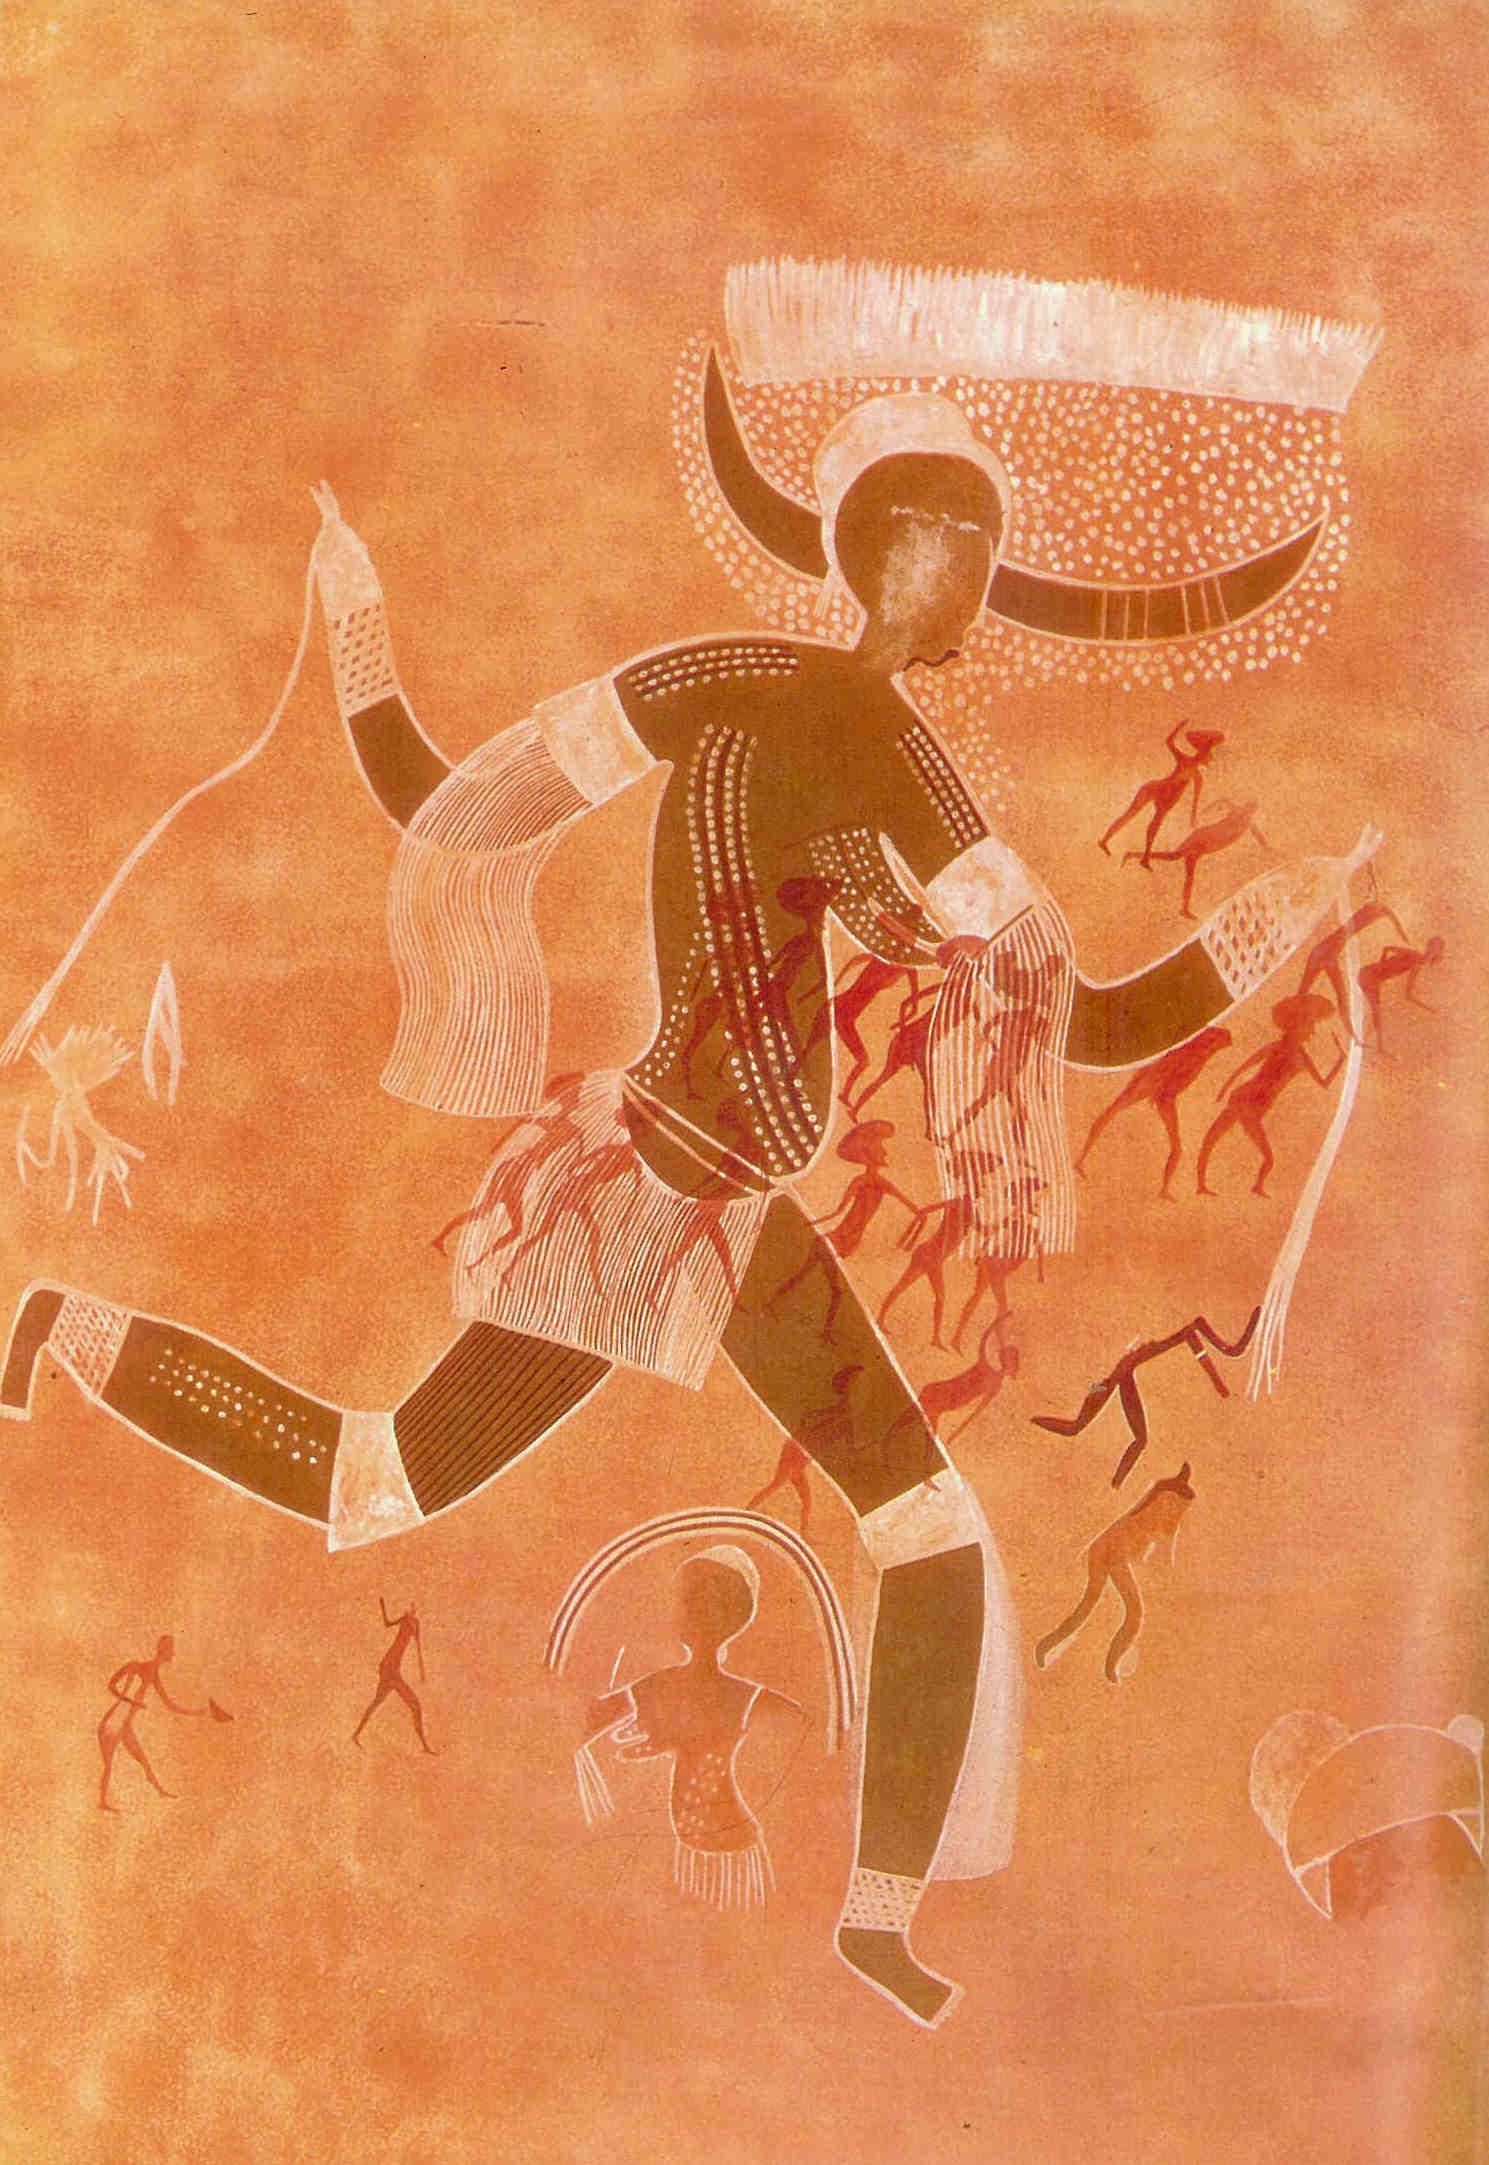 'De Witte dame'. Vruchtbaarheidsgodin uit Aouanrhet. Met hoorns en tarweveld op haar hoofd. Herderscultuur van 5000-1200 v. Chr. 110cm. Tassili N' Ajjer, Algerije.